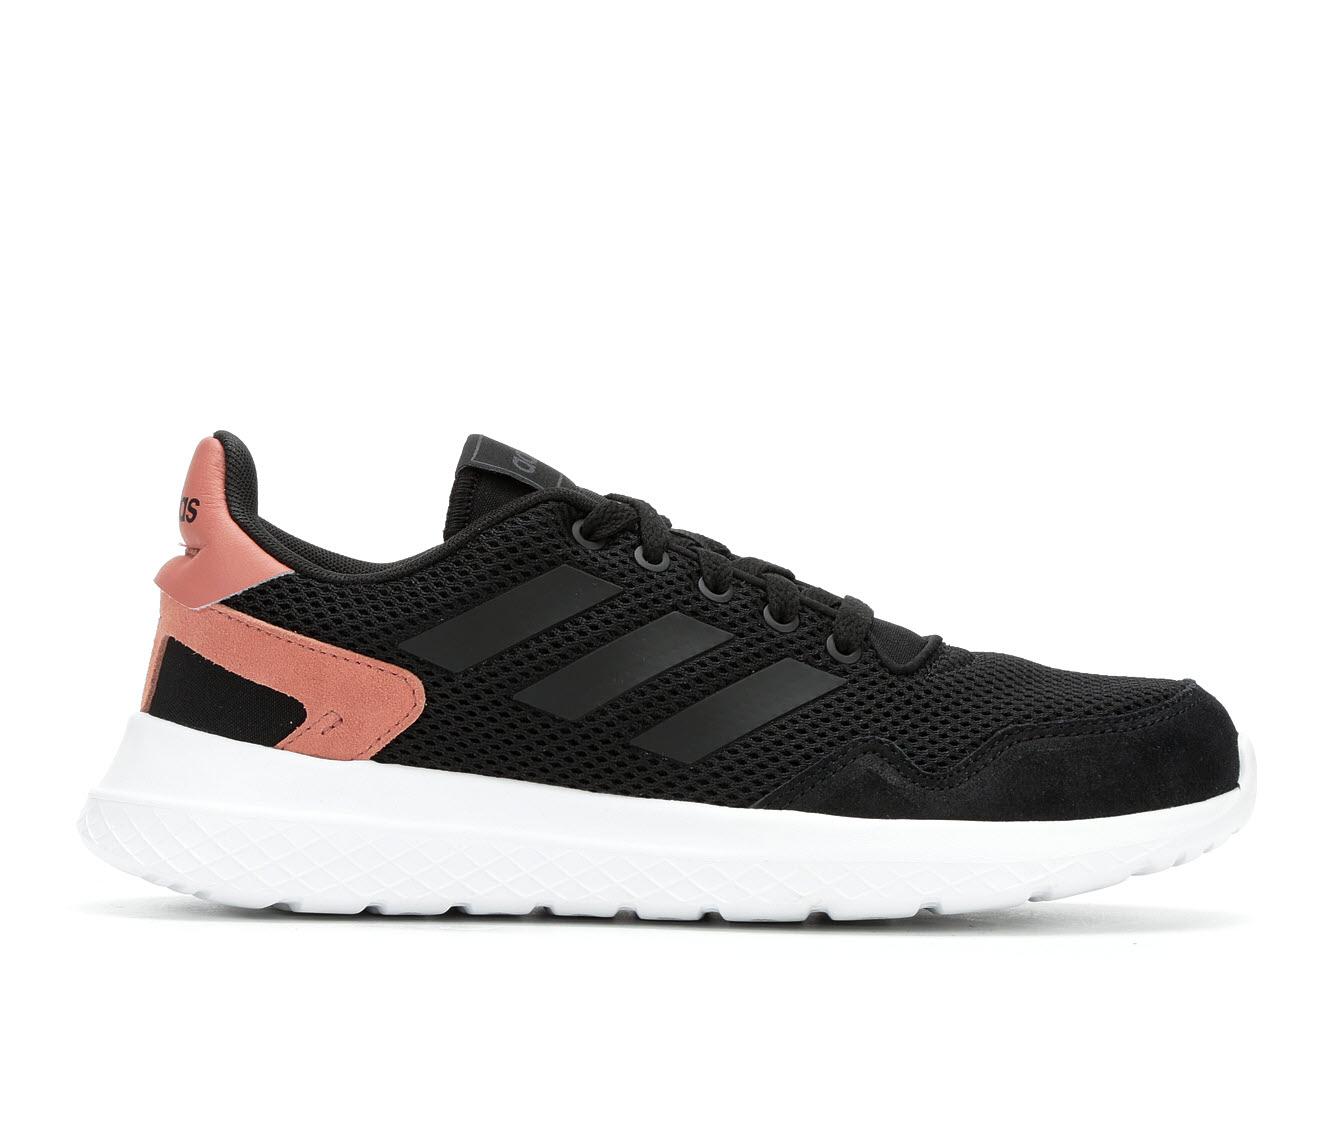 Adidas Archivo Women's Athletic Shoe (Black)